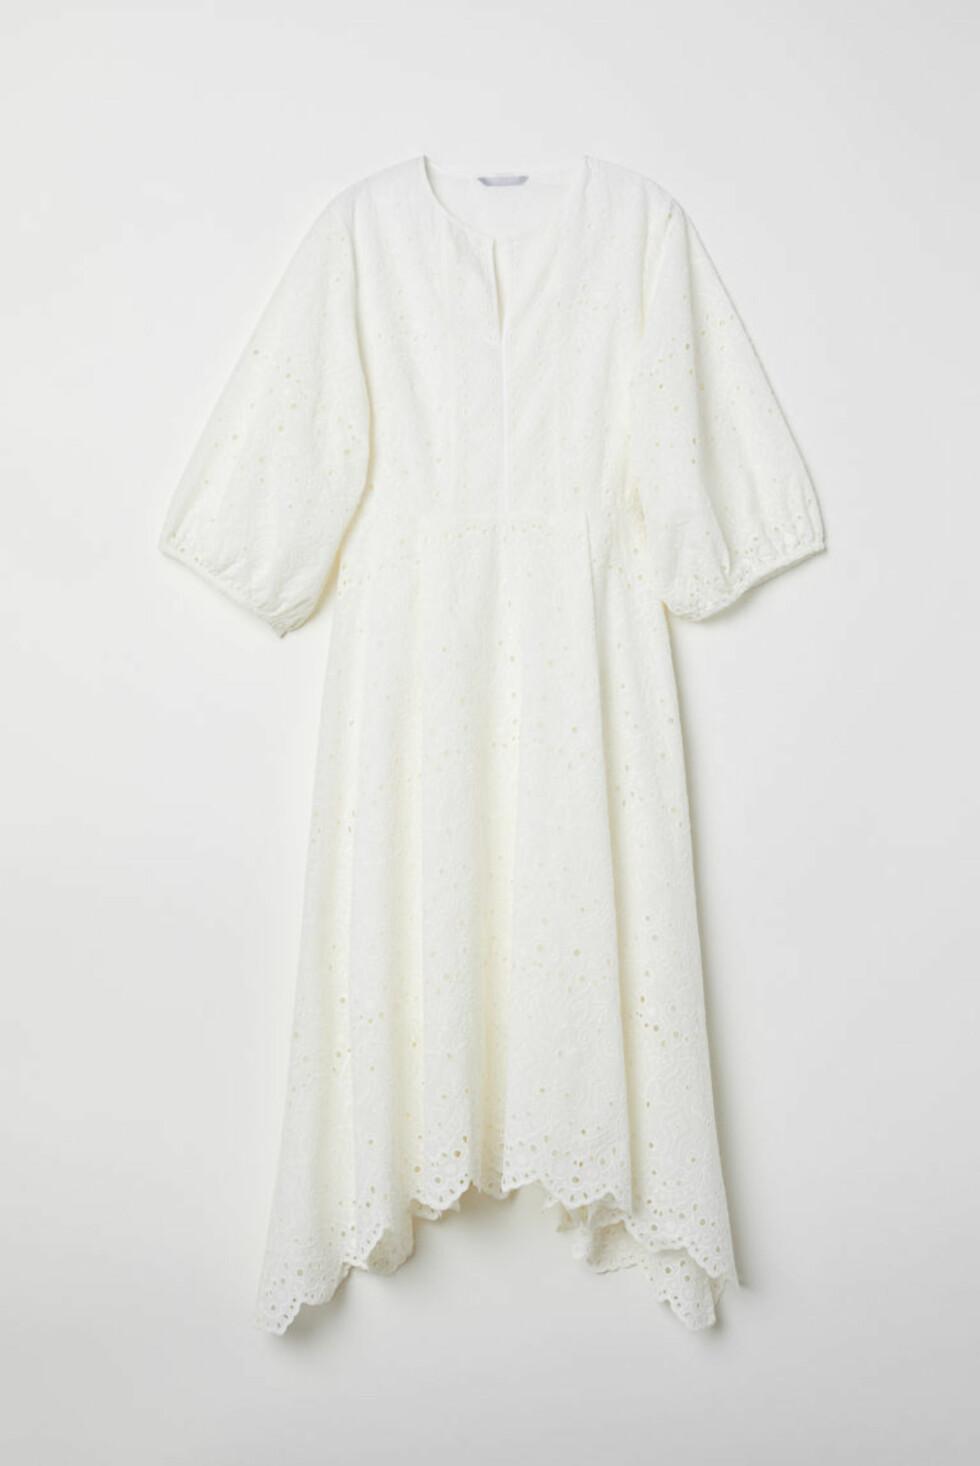 Kjole fra H&M |799,-| http://www2.hm.com/no_no/productpage.0656592001.html